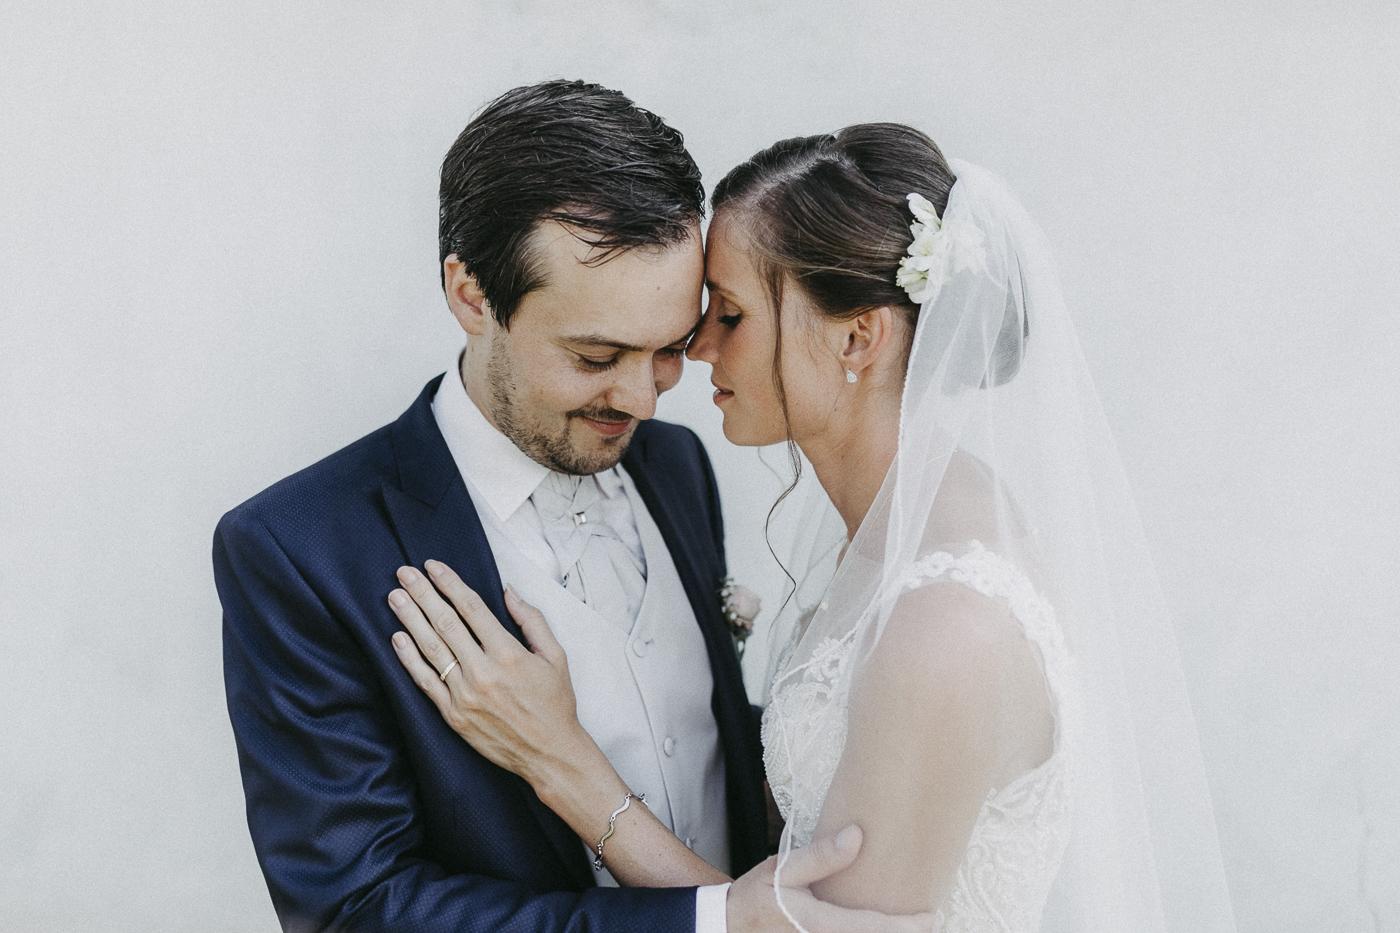 rosemarrylemon_ND_Hochzeit_Hochzeitsplanung10.jpg